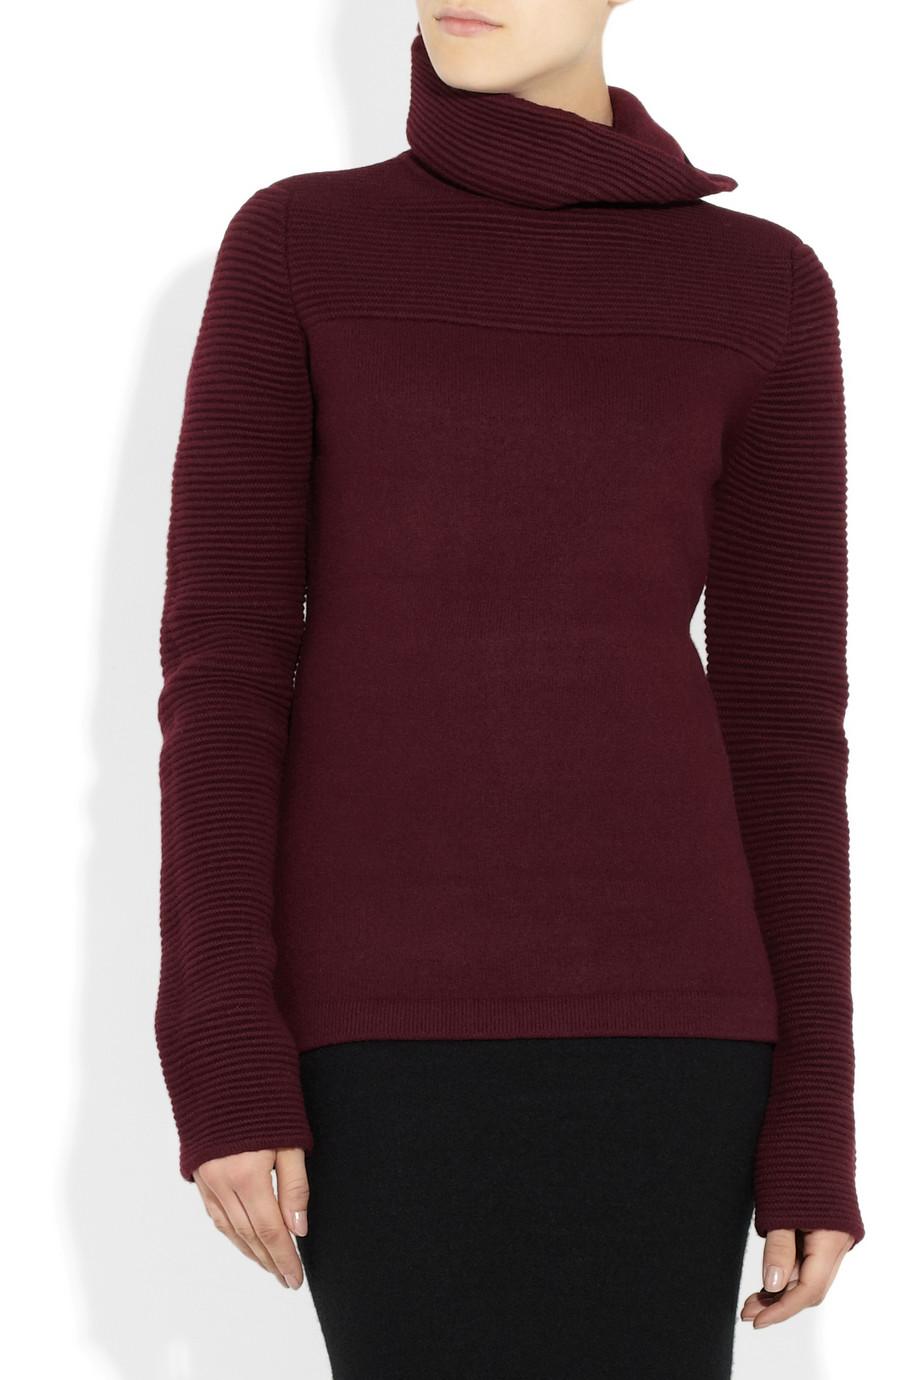 haider ackermann wool turtleneck sweater in purple lyst. Black Bedroom Furniture Sets. Home Design Ideas